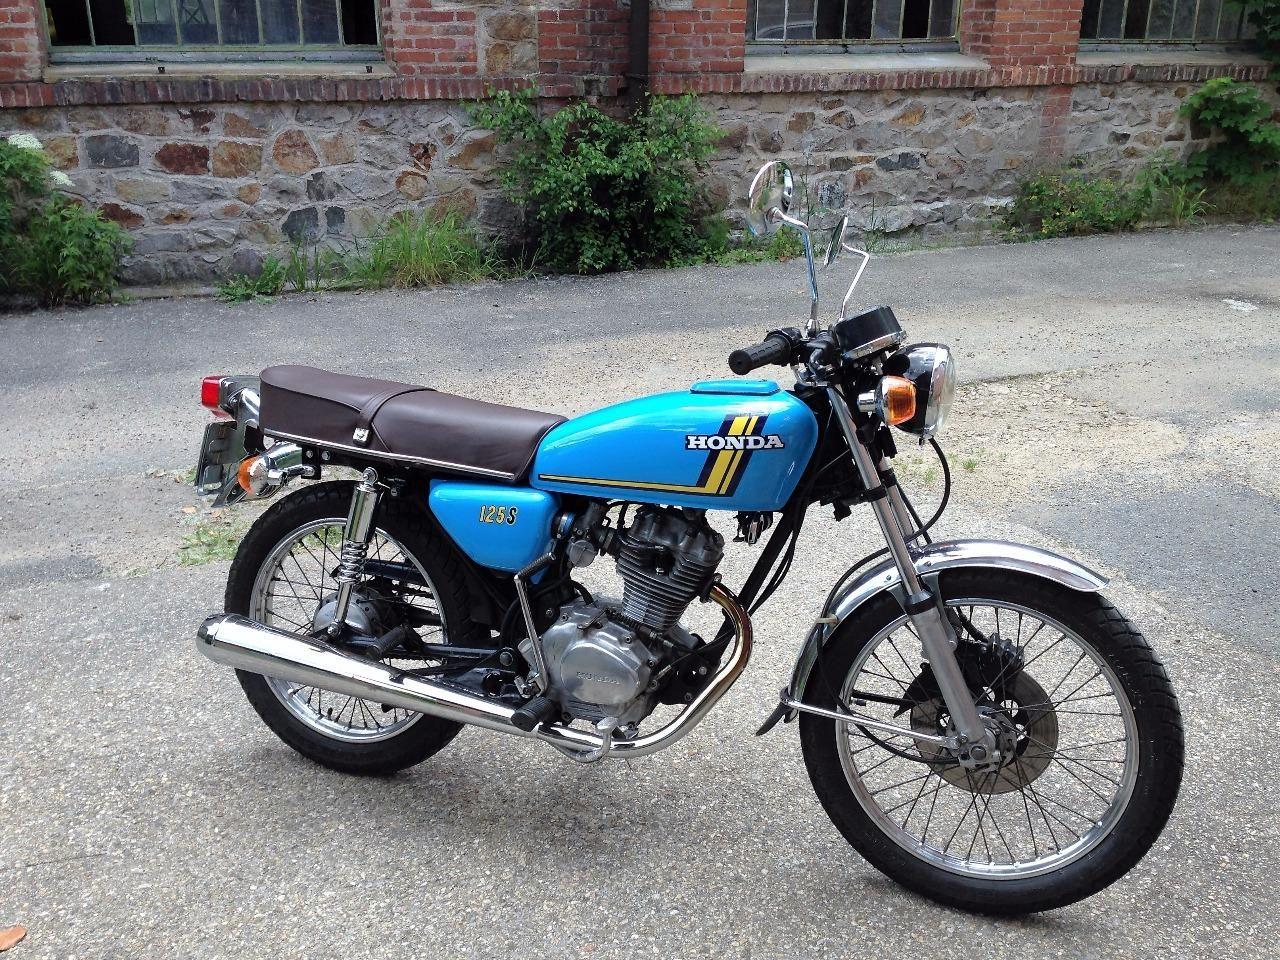 dad 39 s motorcycle honda 125 cb s3 1976 bikes with motors pinterest honda loin et moto. Black Bedroom Furniture Sets. Home Design Ideas